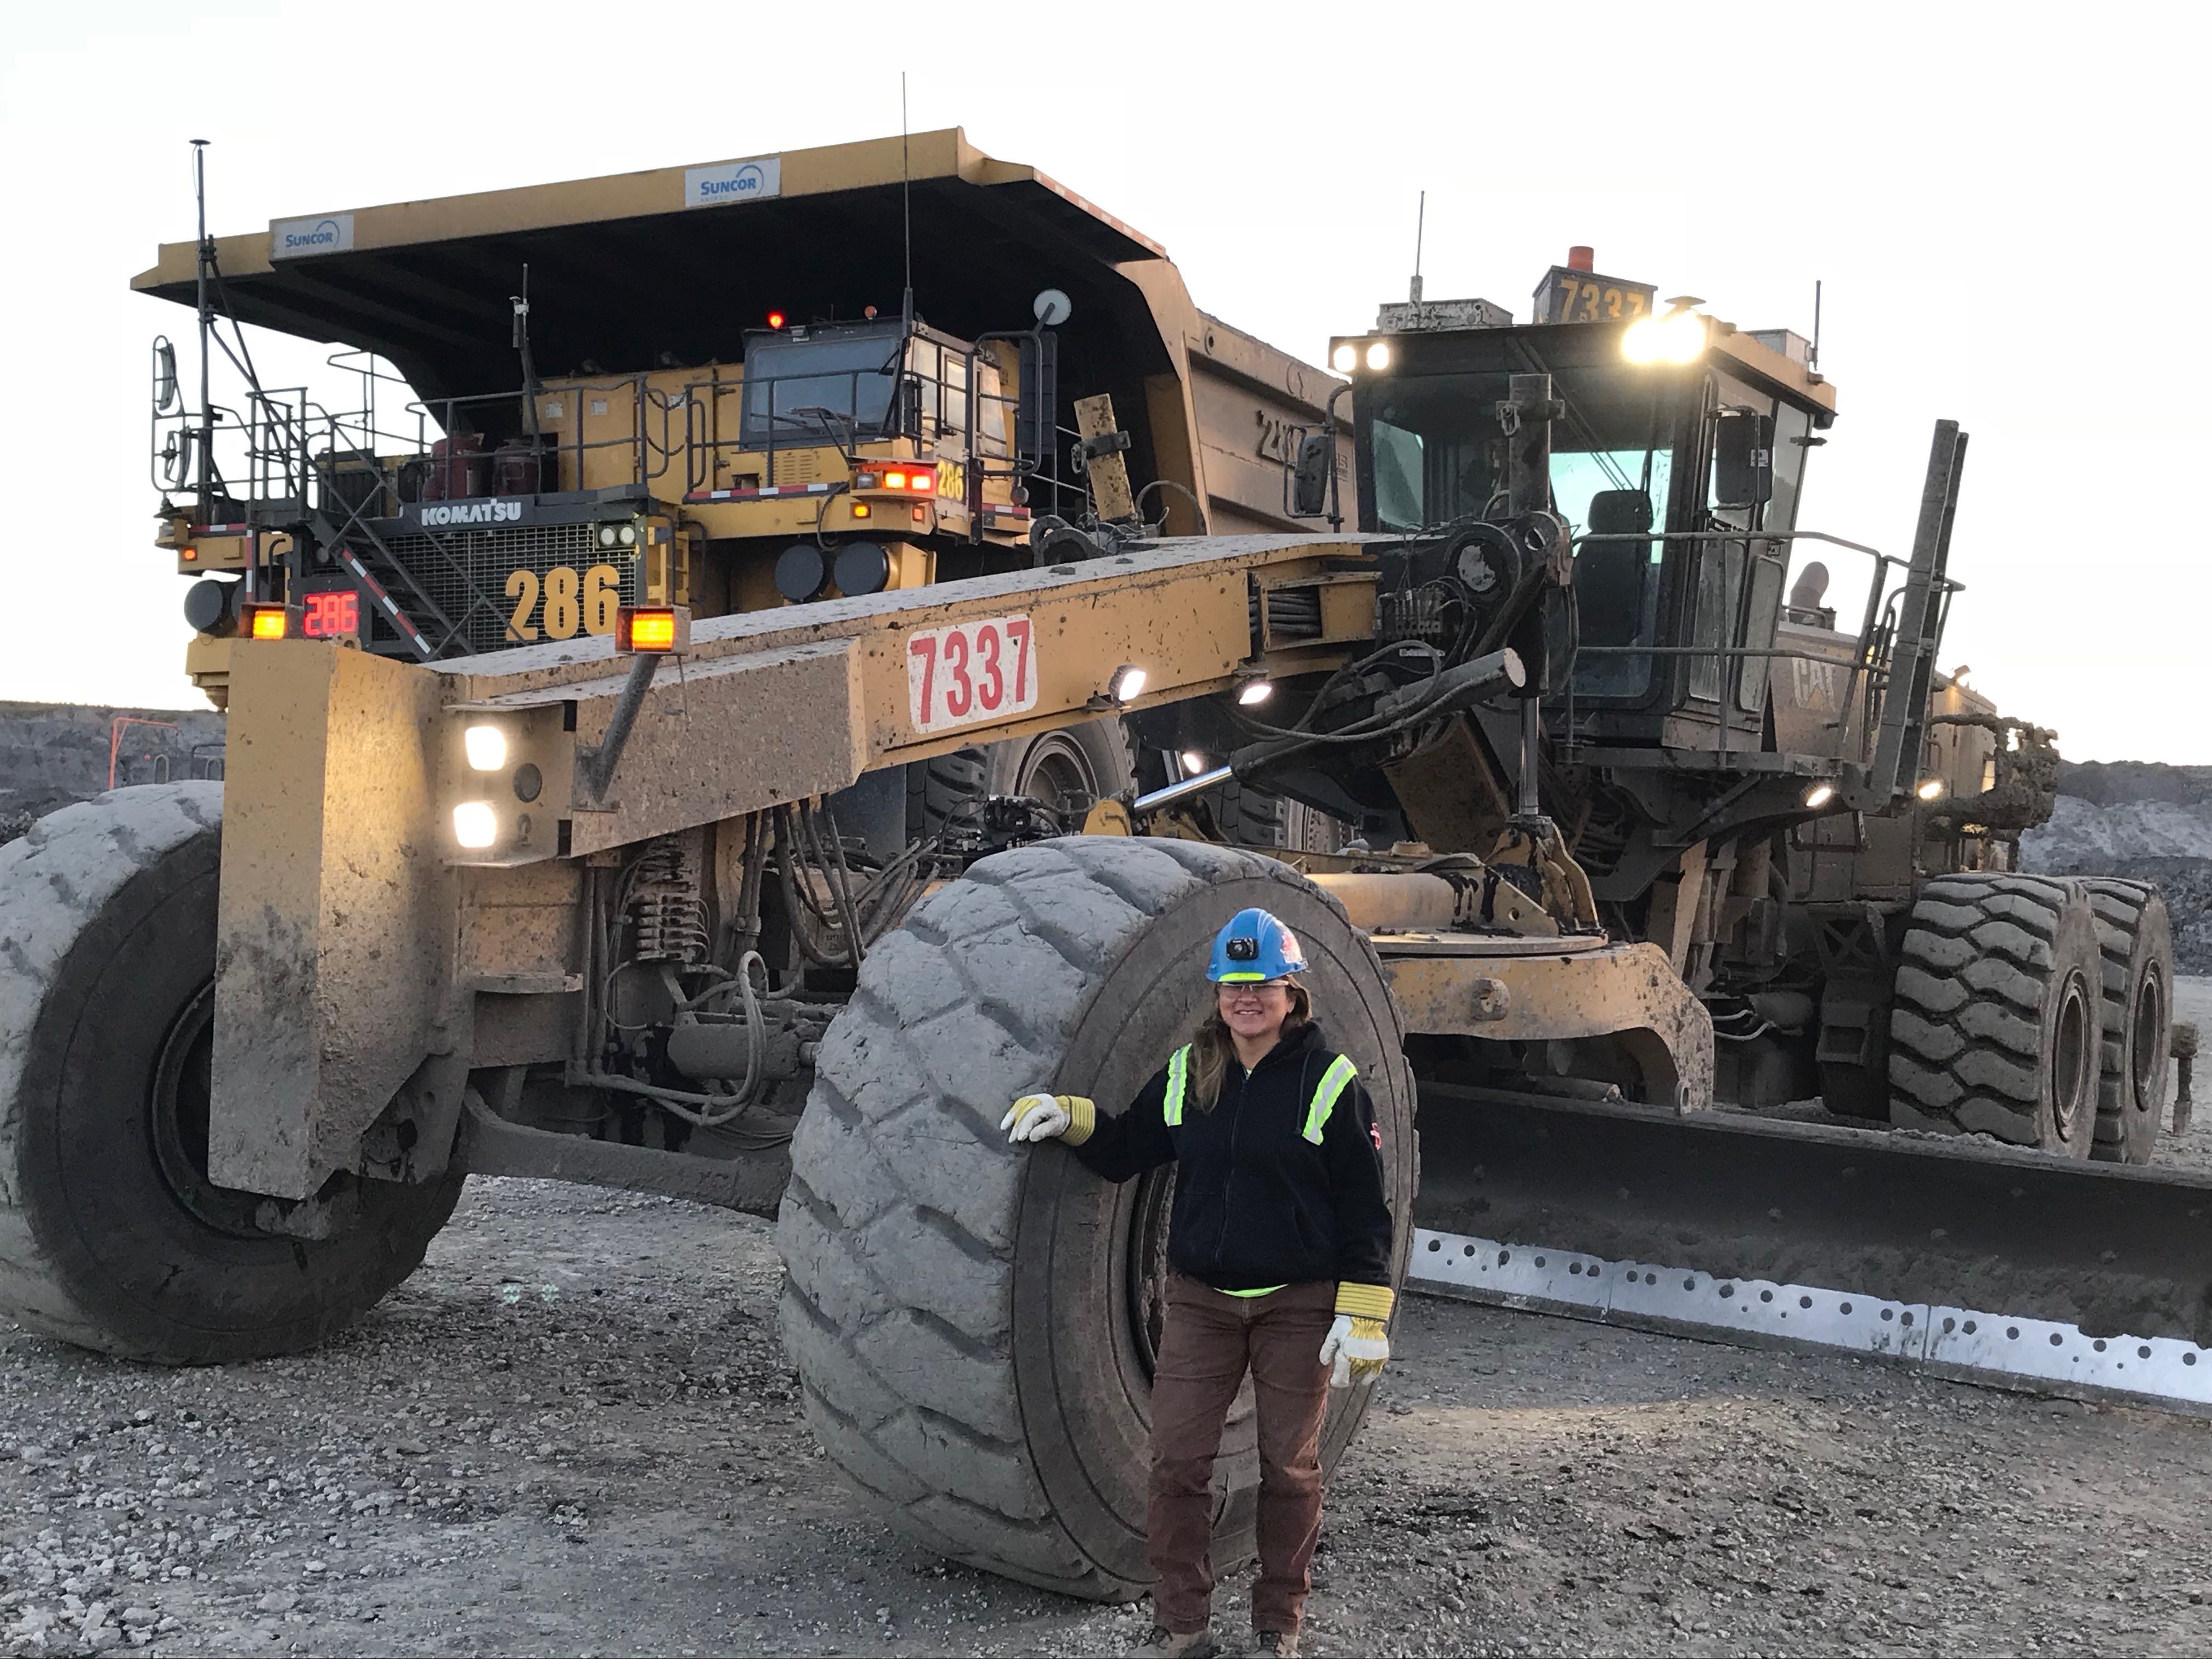 Estella Petersen - Heavy Equipment Operator & Indigenous Woman in the Oil Sands